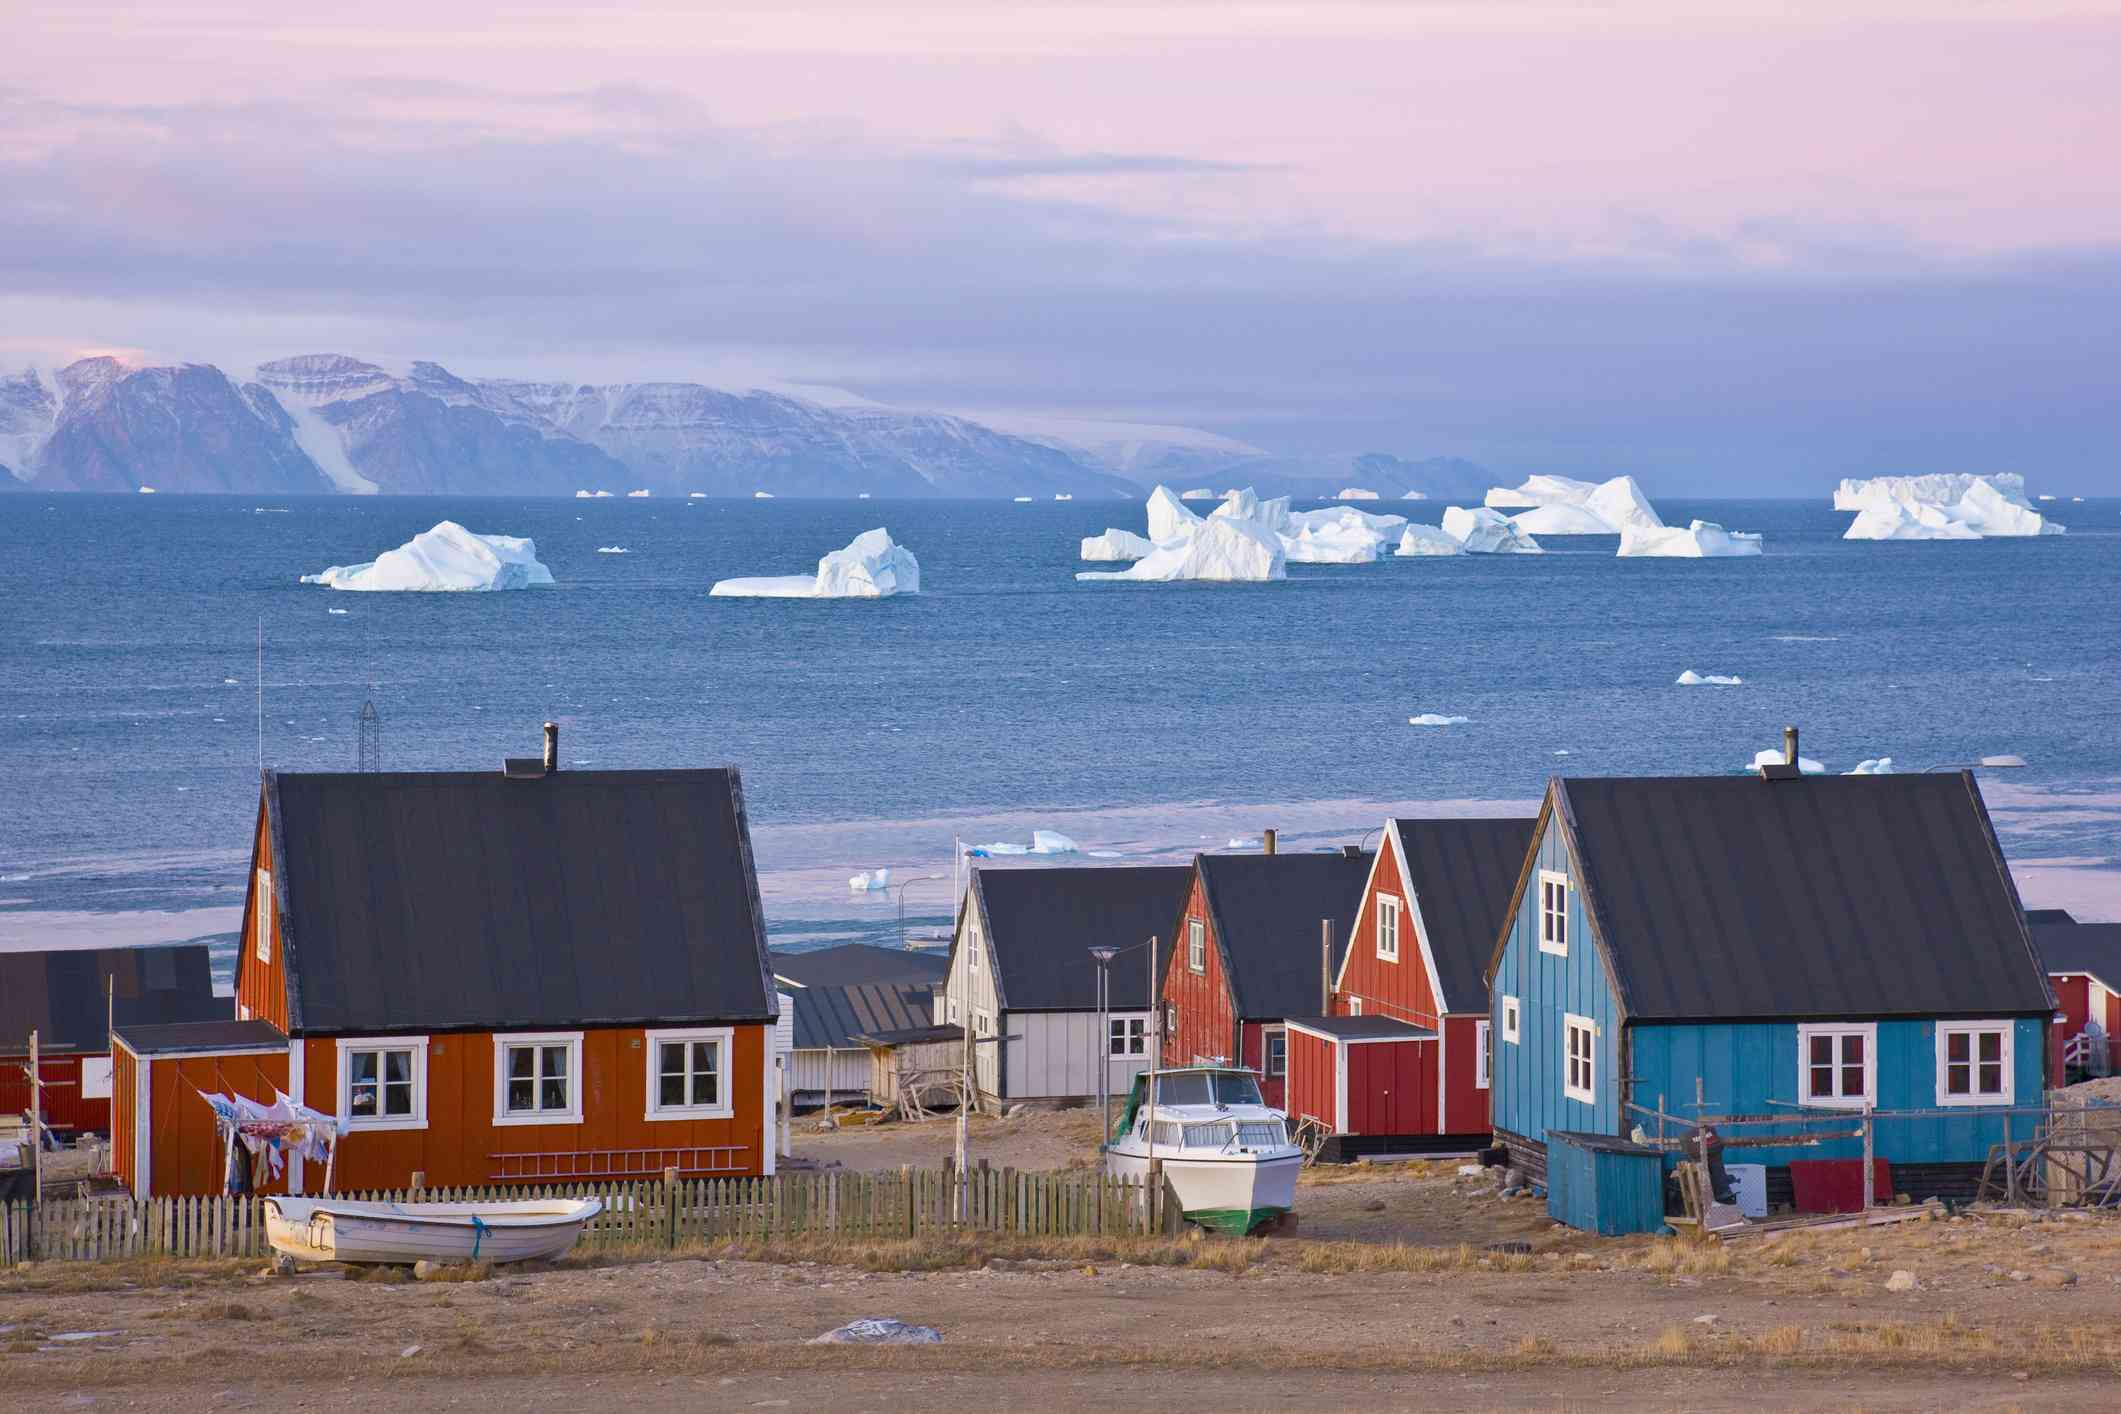 Sunrise in Qaanaaq in Northwest Greenland